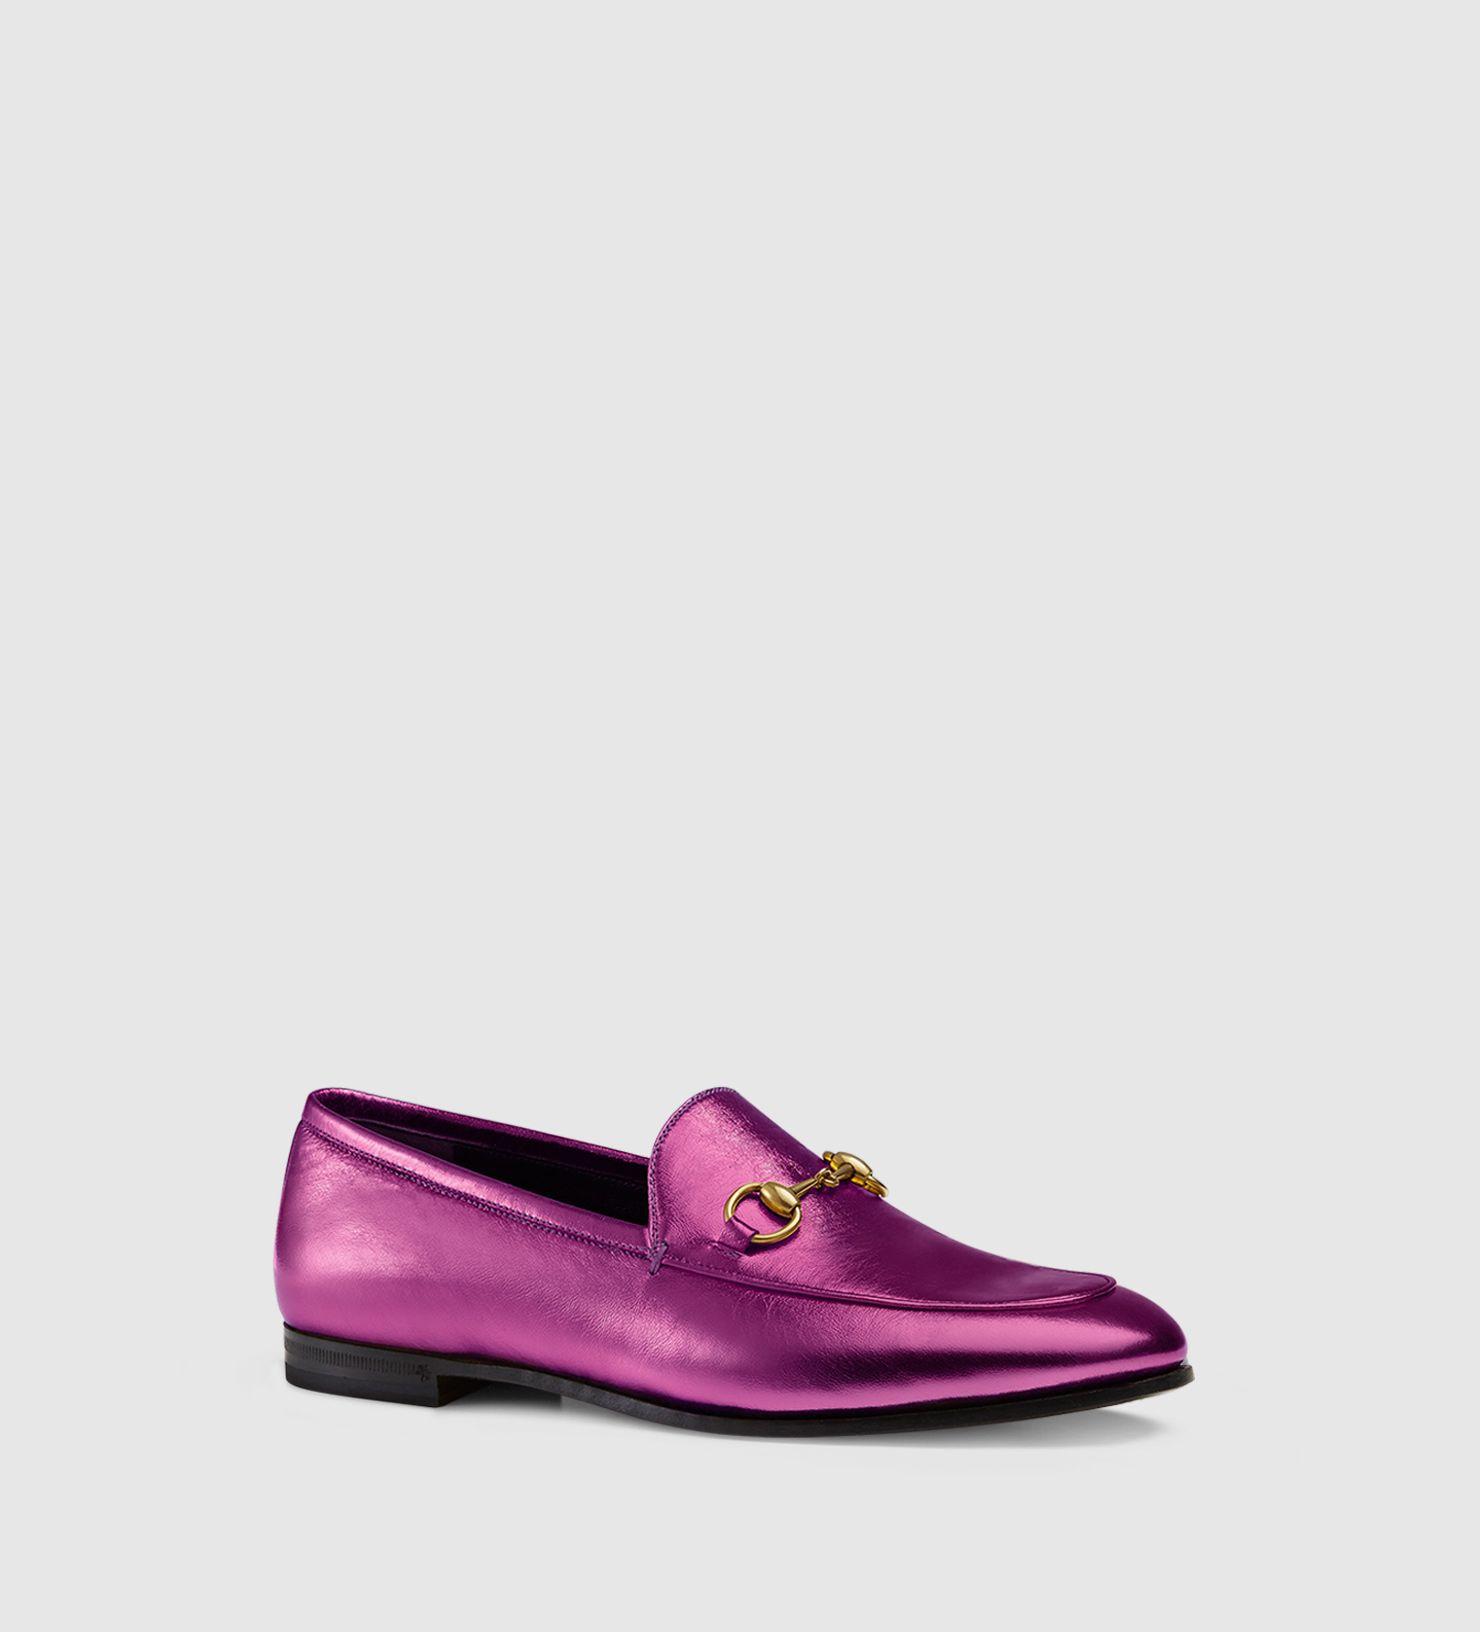 6675886b9cd gucci jordaan metallic loafer